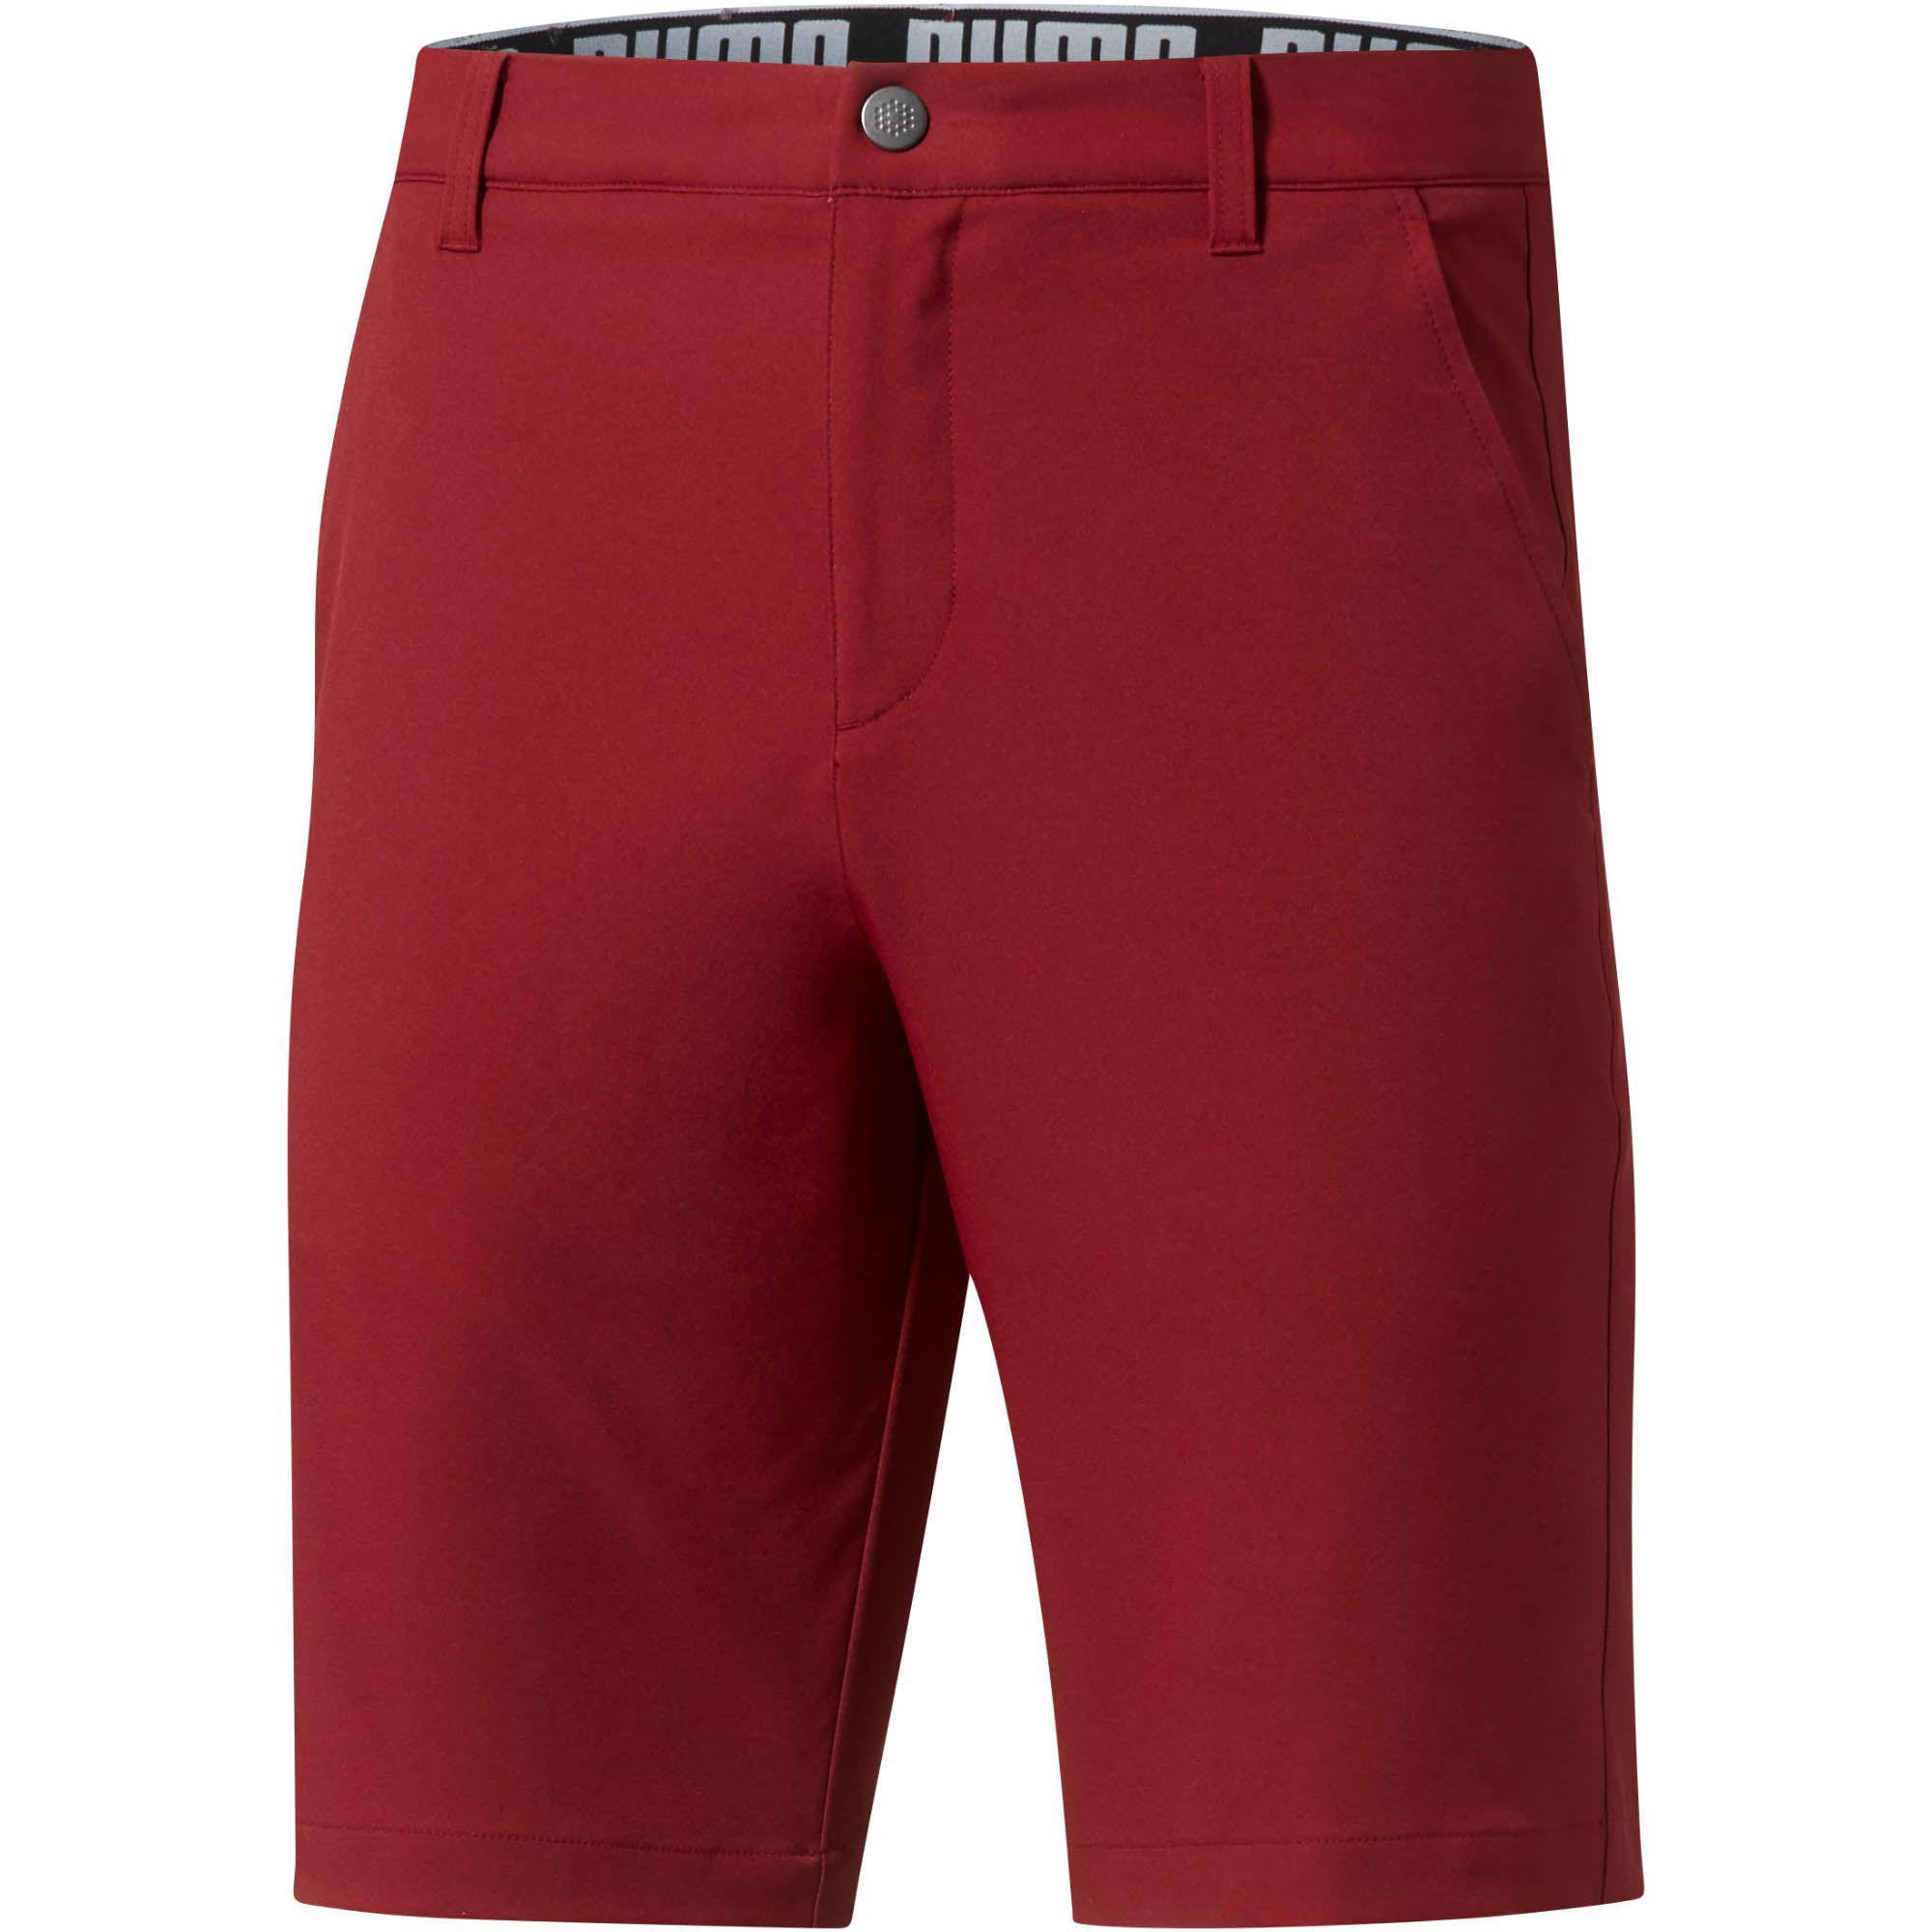 9ecbe0b25c95 Lyst - PUMA Golf Men s Essential Pounce Shorts in Red for Men